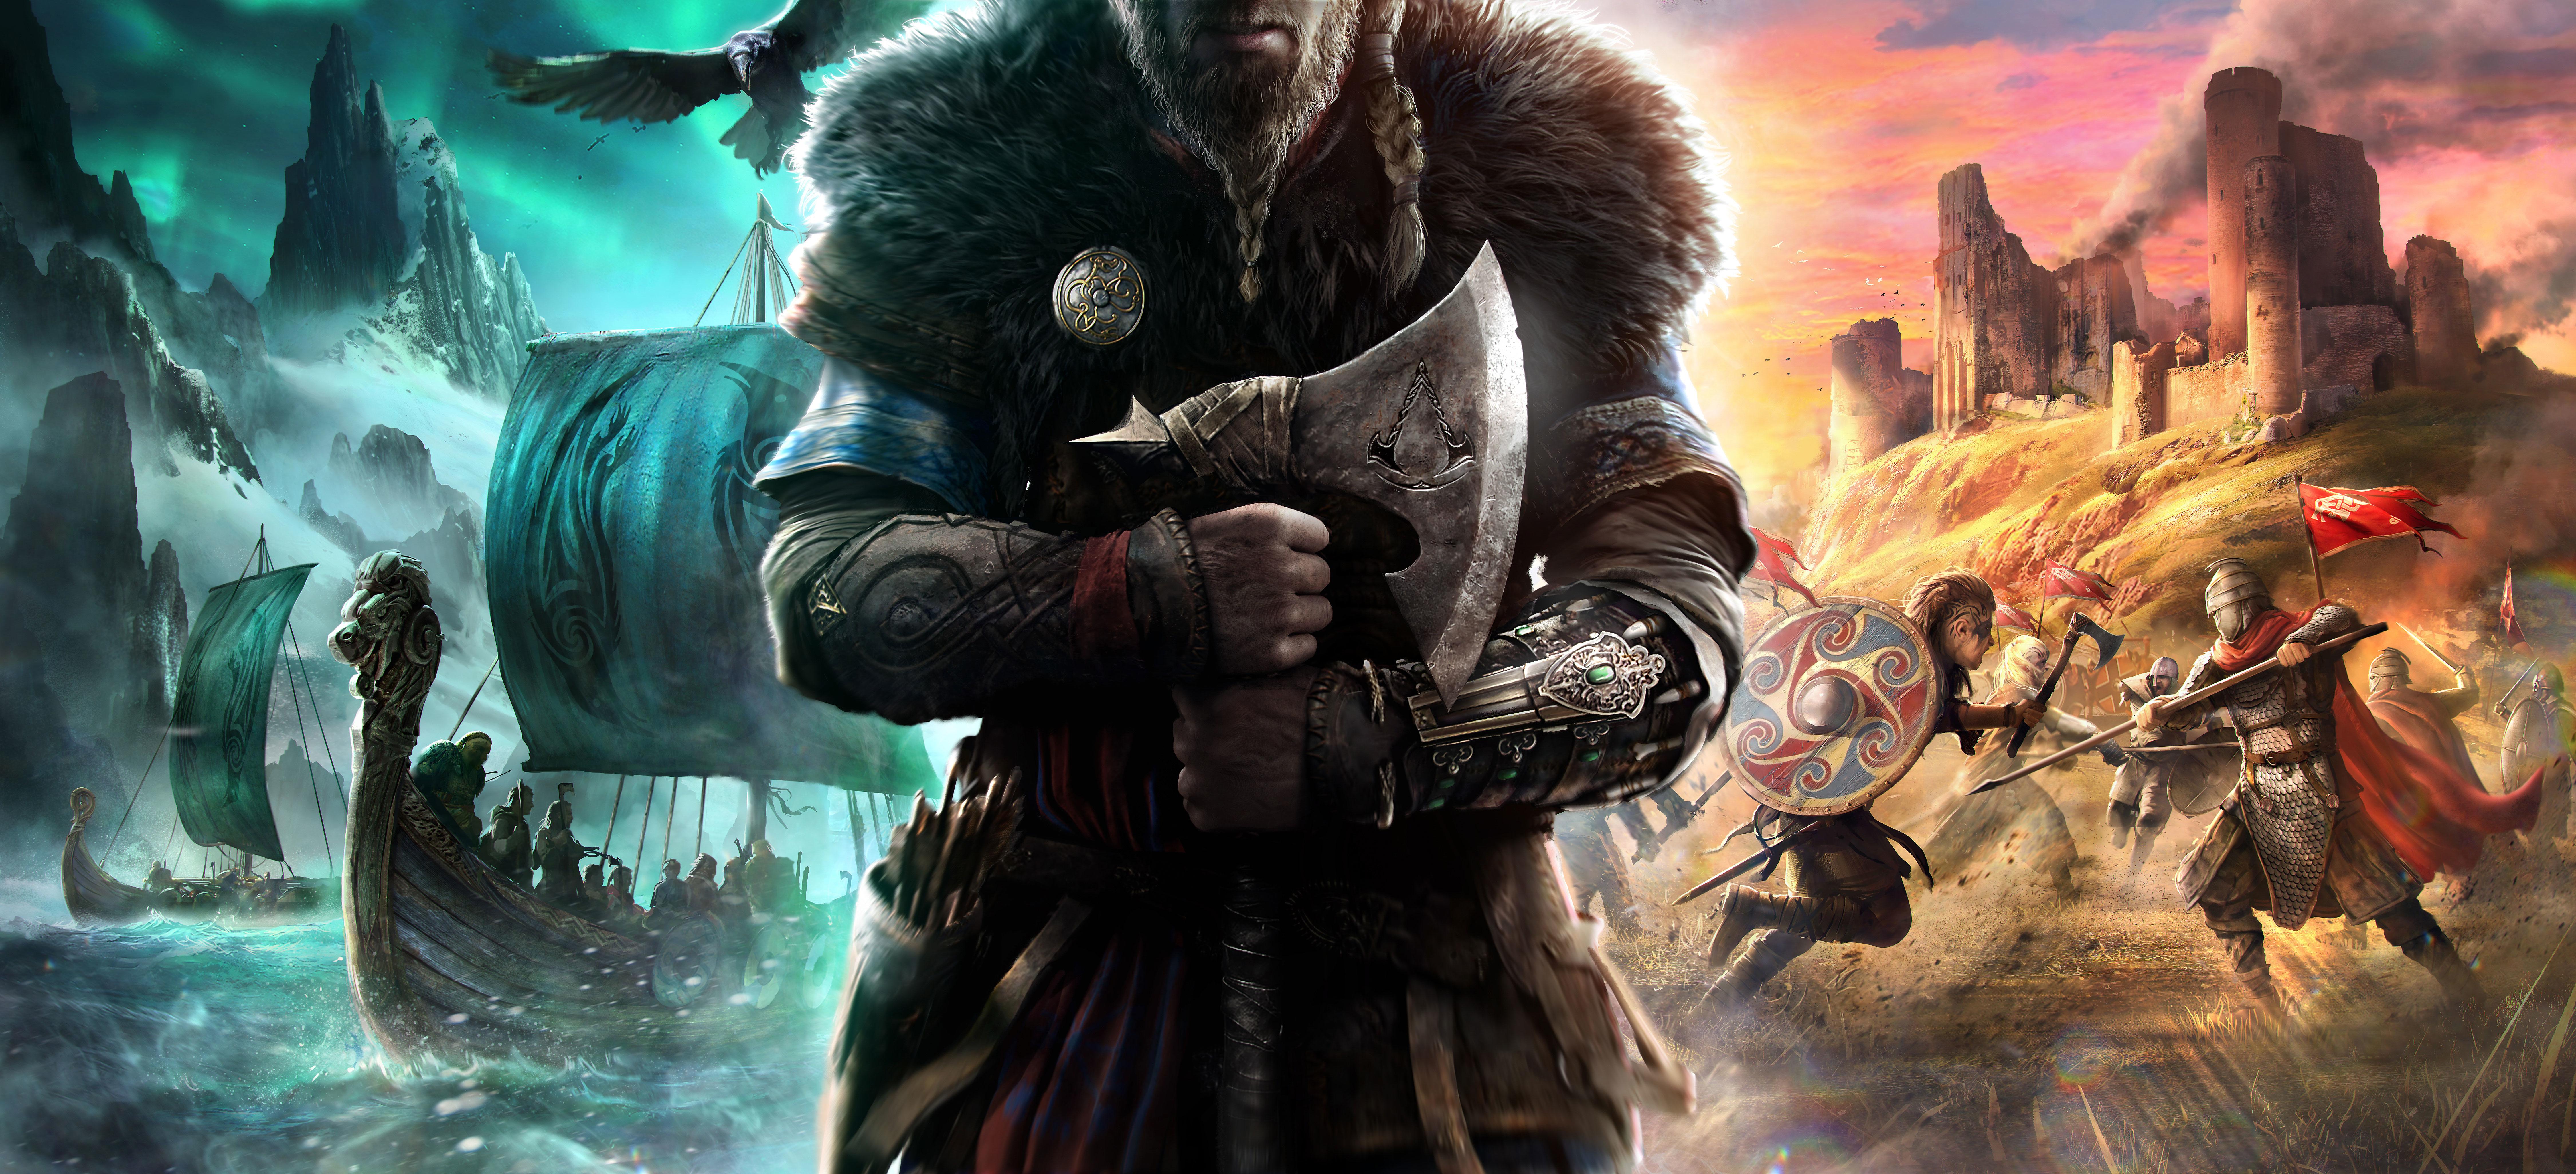 Assassins Creed Valhalla 8k Wallpaper Hd Games 4k Wallpapers